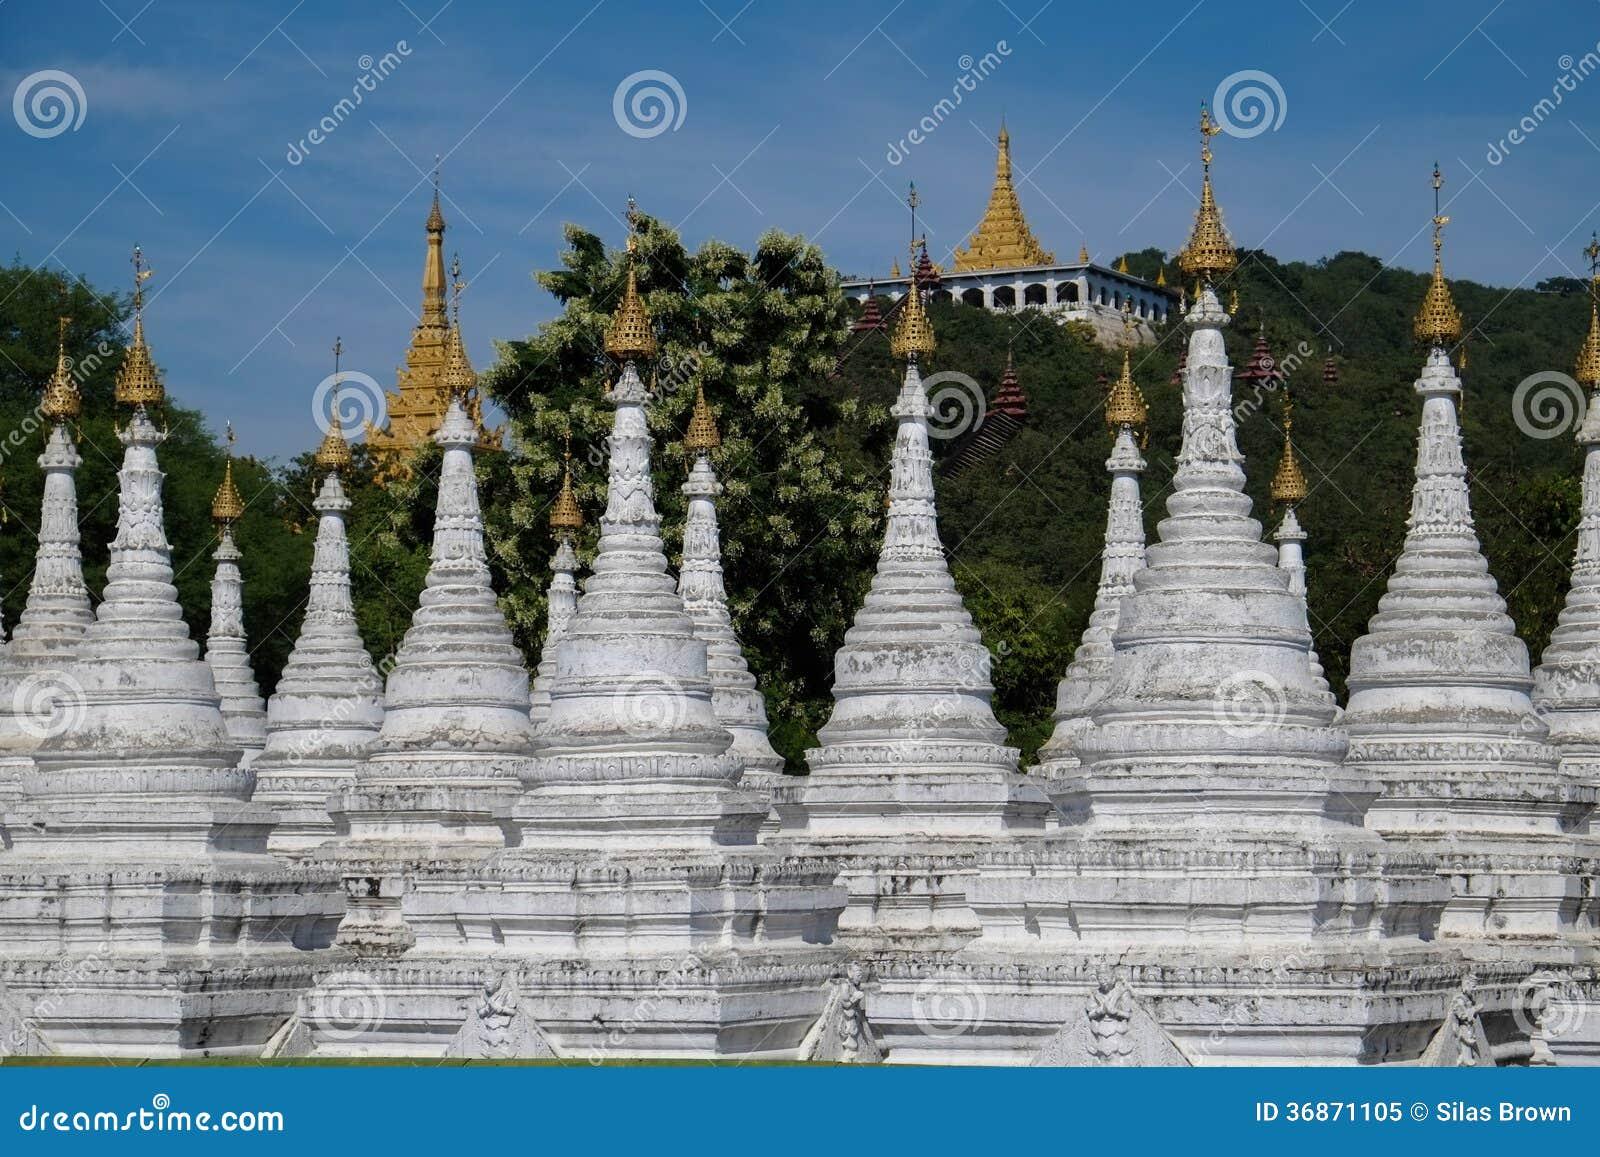 Mandalay wzgórze